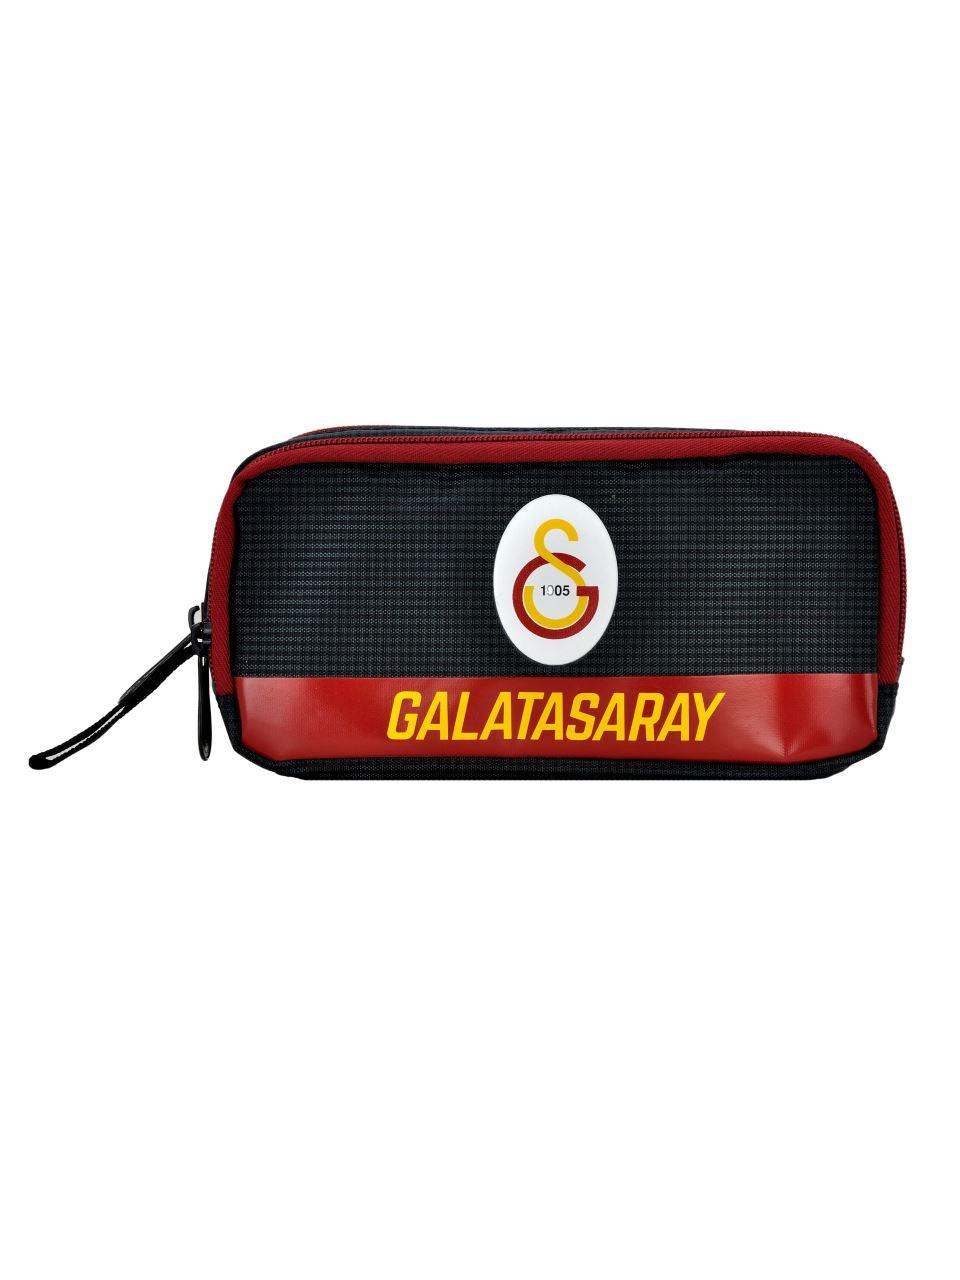 U13014 Galatasaray Kalem Çantası 95515